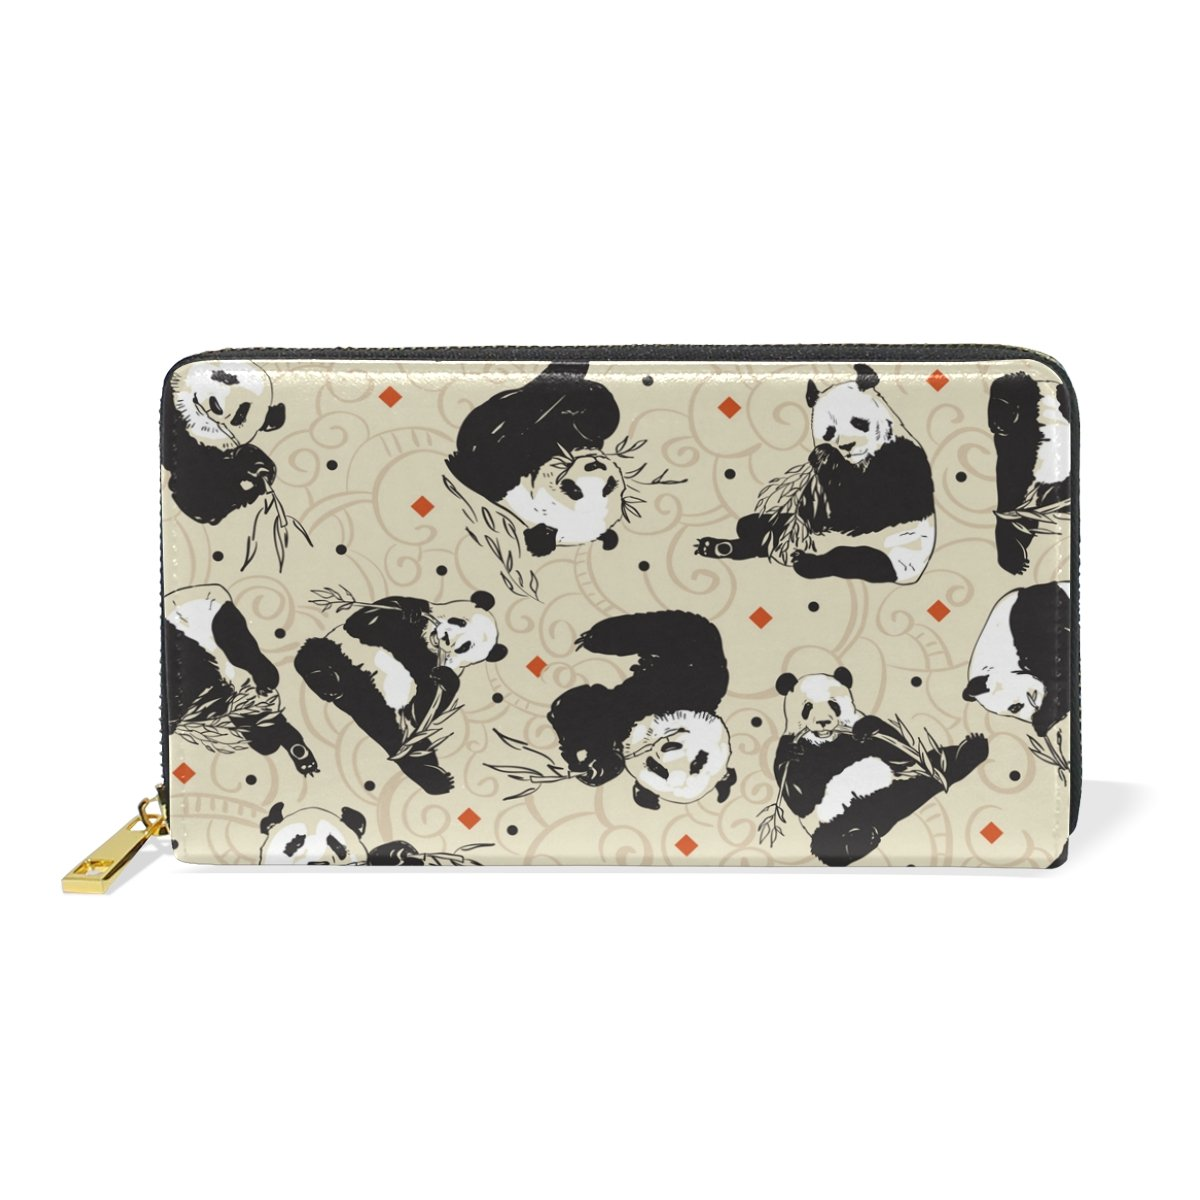 LAVOVO Cute Pandas Bamboo Womens Clutch Purses Organizer And Handbags Zip Around Wallet